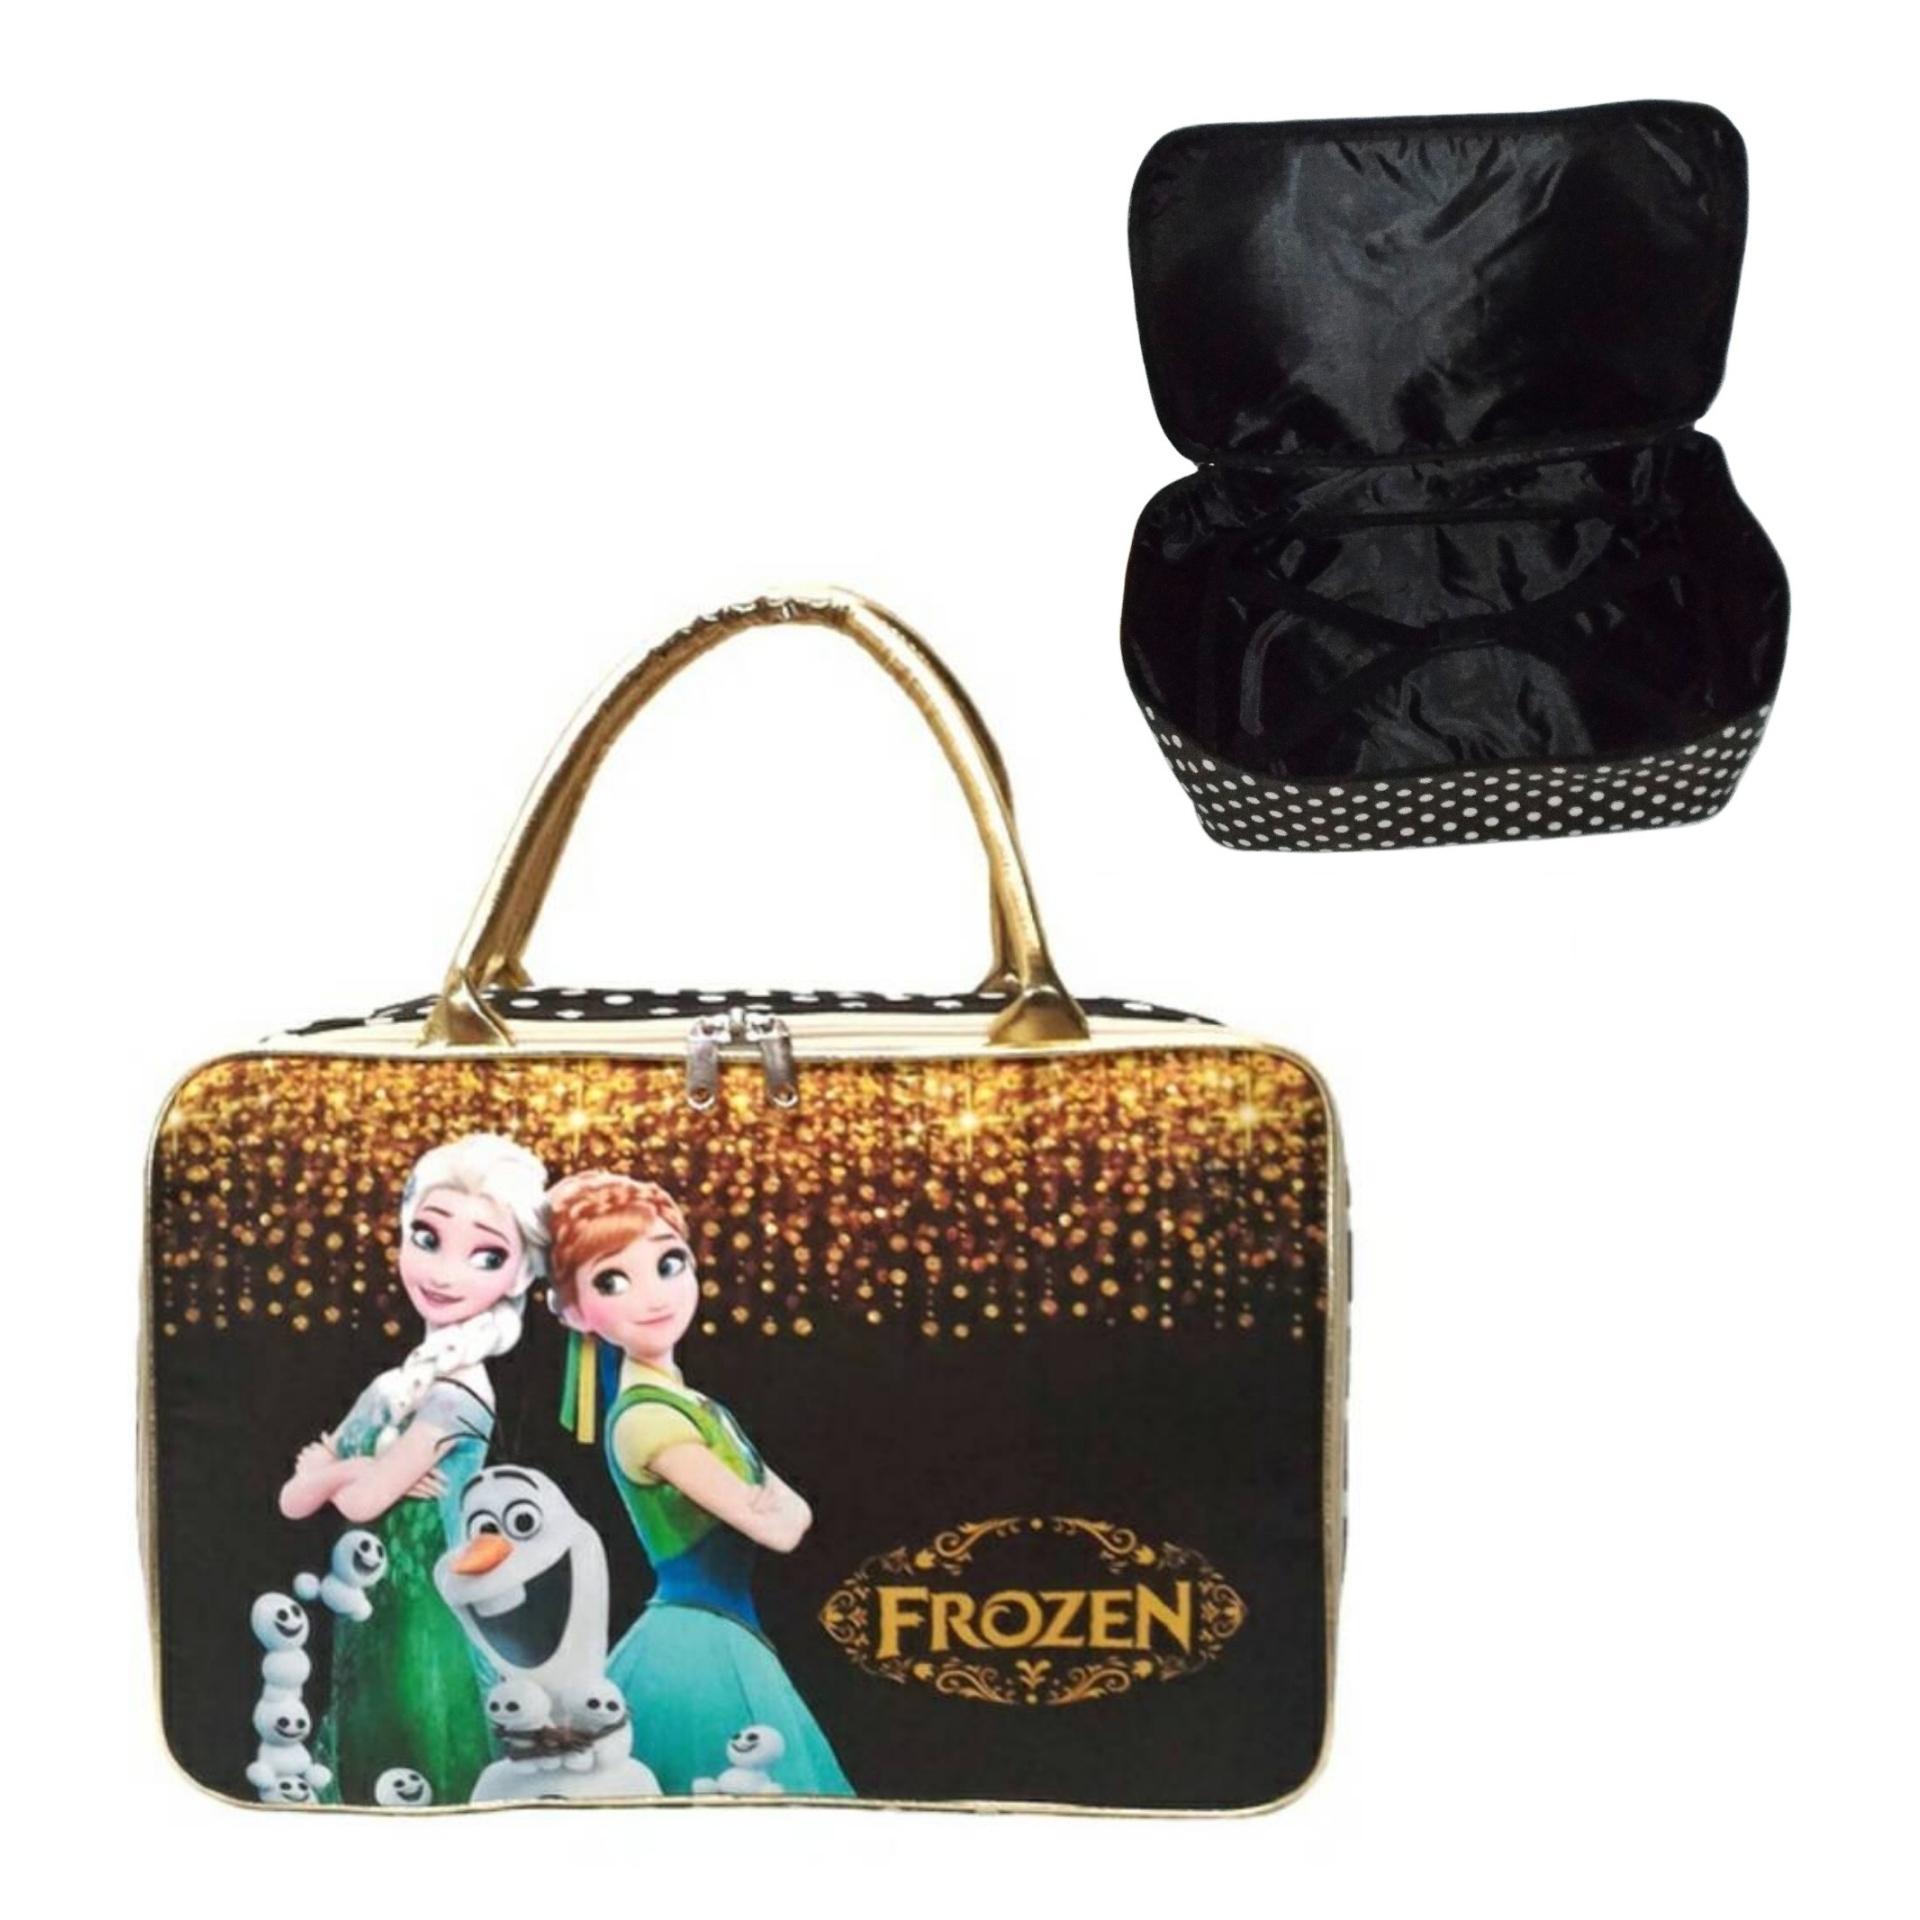 AMT Travel Bag Koper Anak Kanvas dengan Karet Pengikat Baju Frozen Hitam Gold